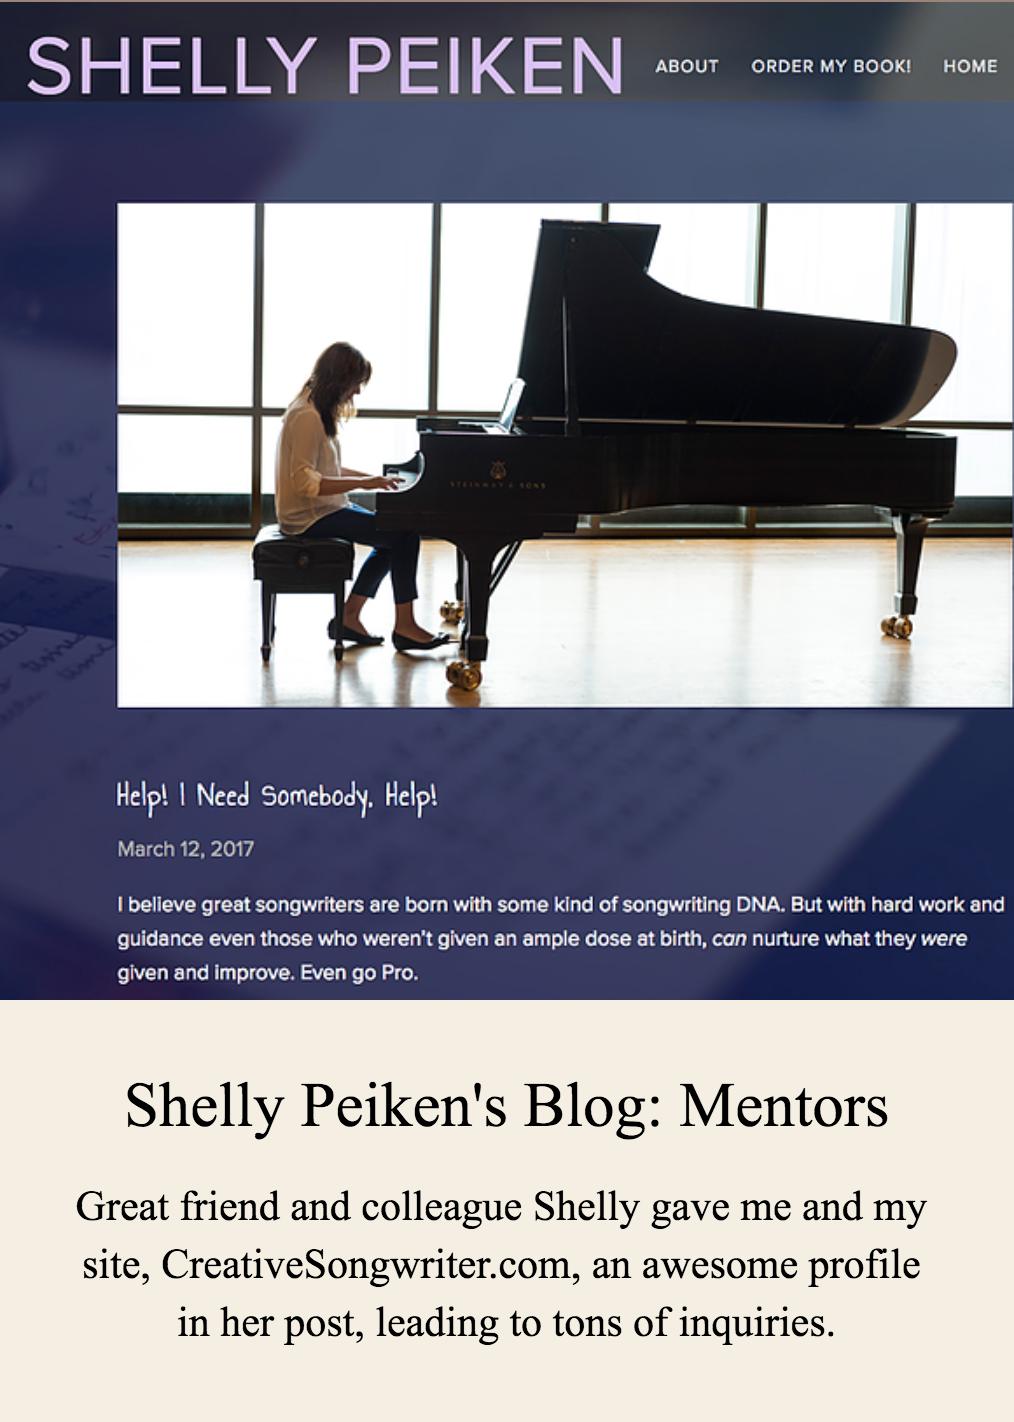 Shelly Peiken's Blog - Mentors